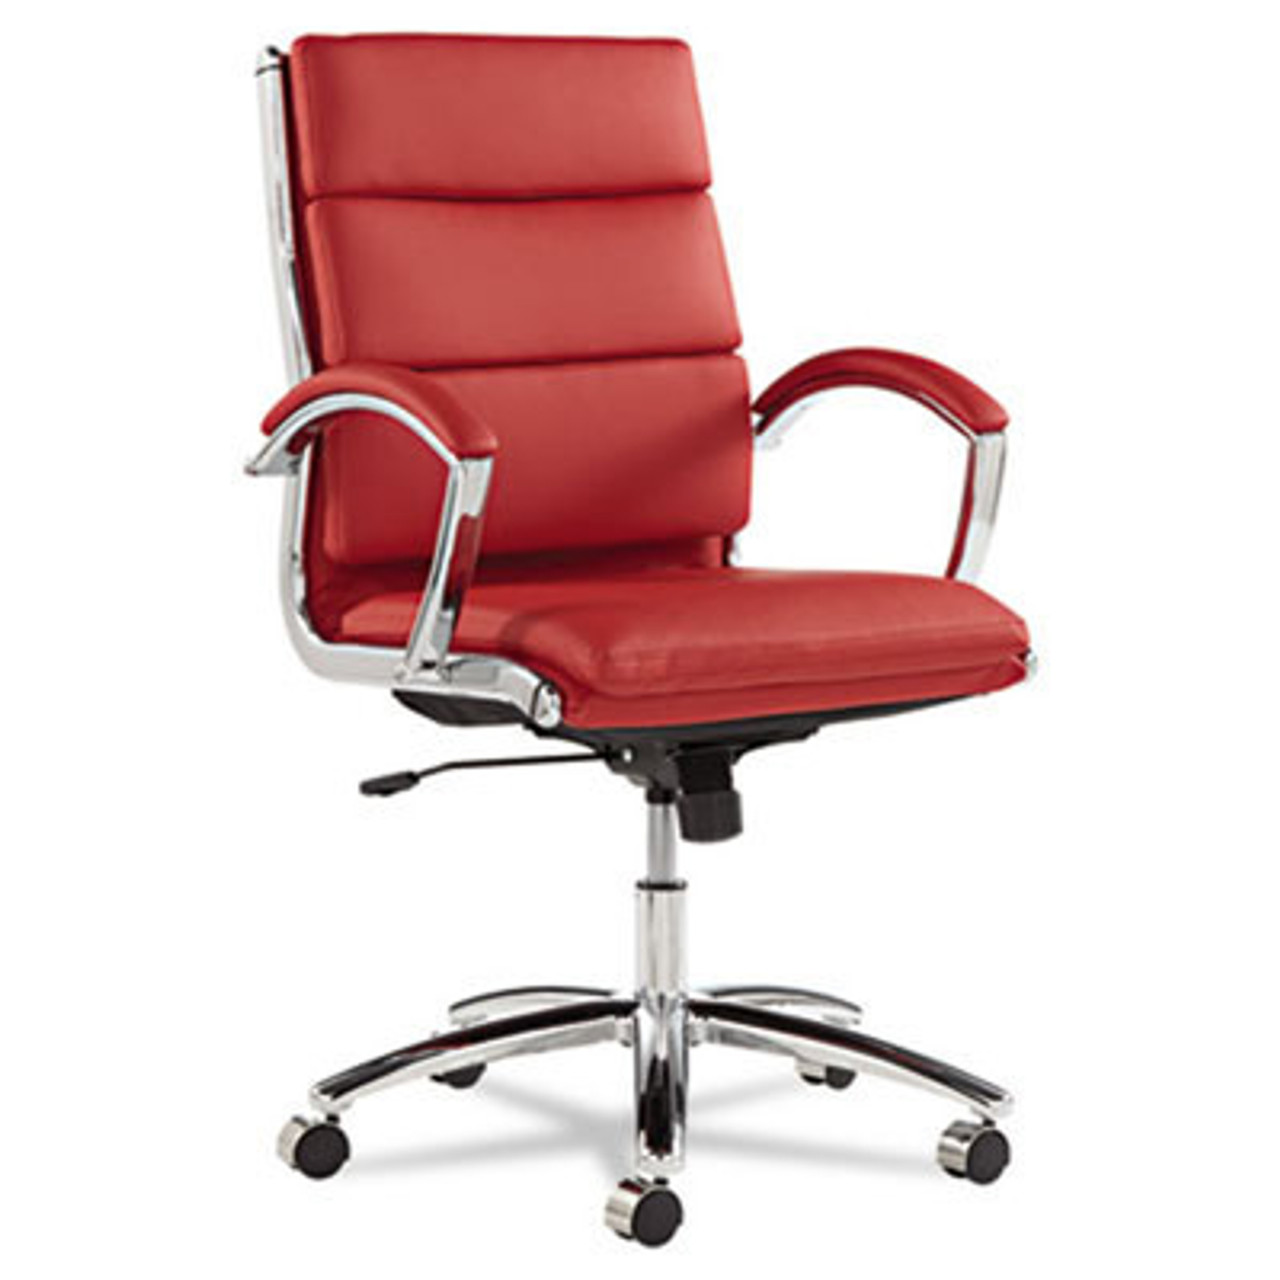 Mid Back Modern Leather Swivel/Tilt Office Chair, #AL-NR4239